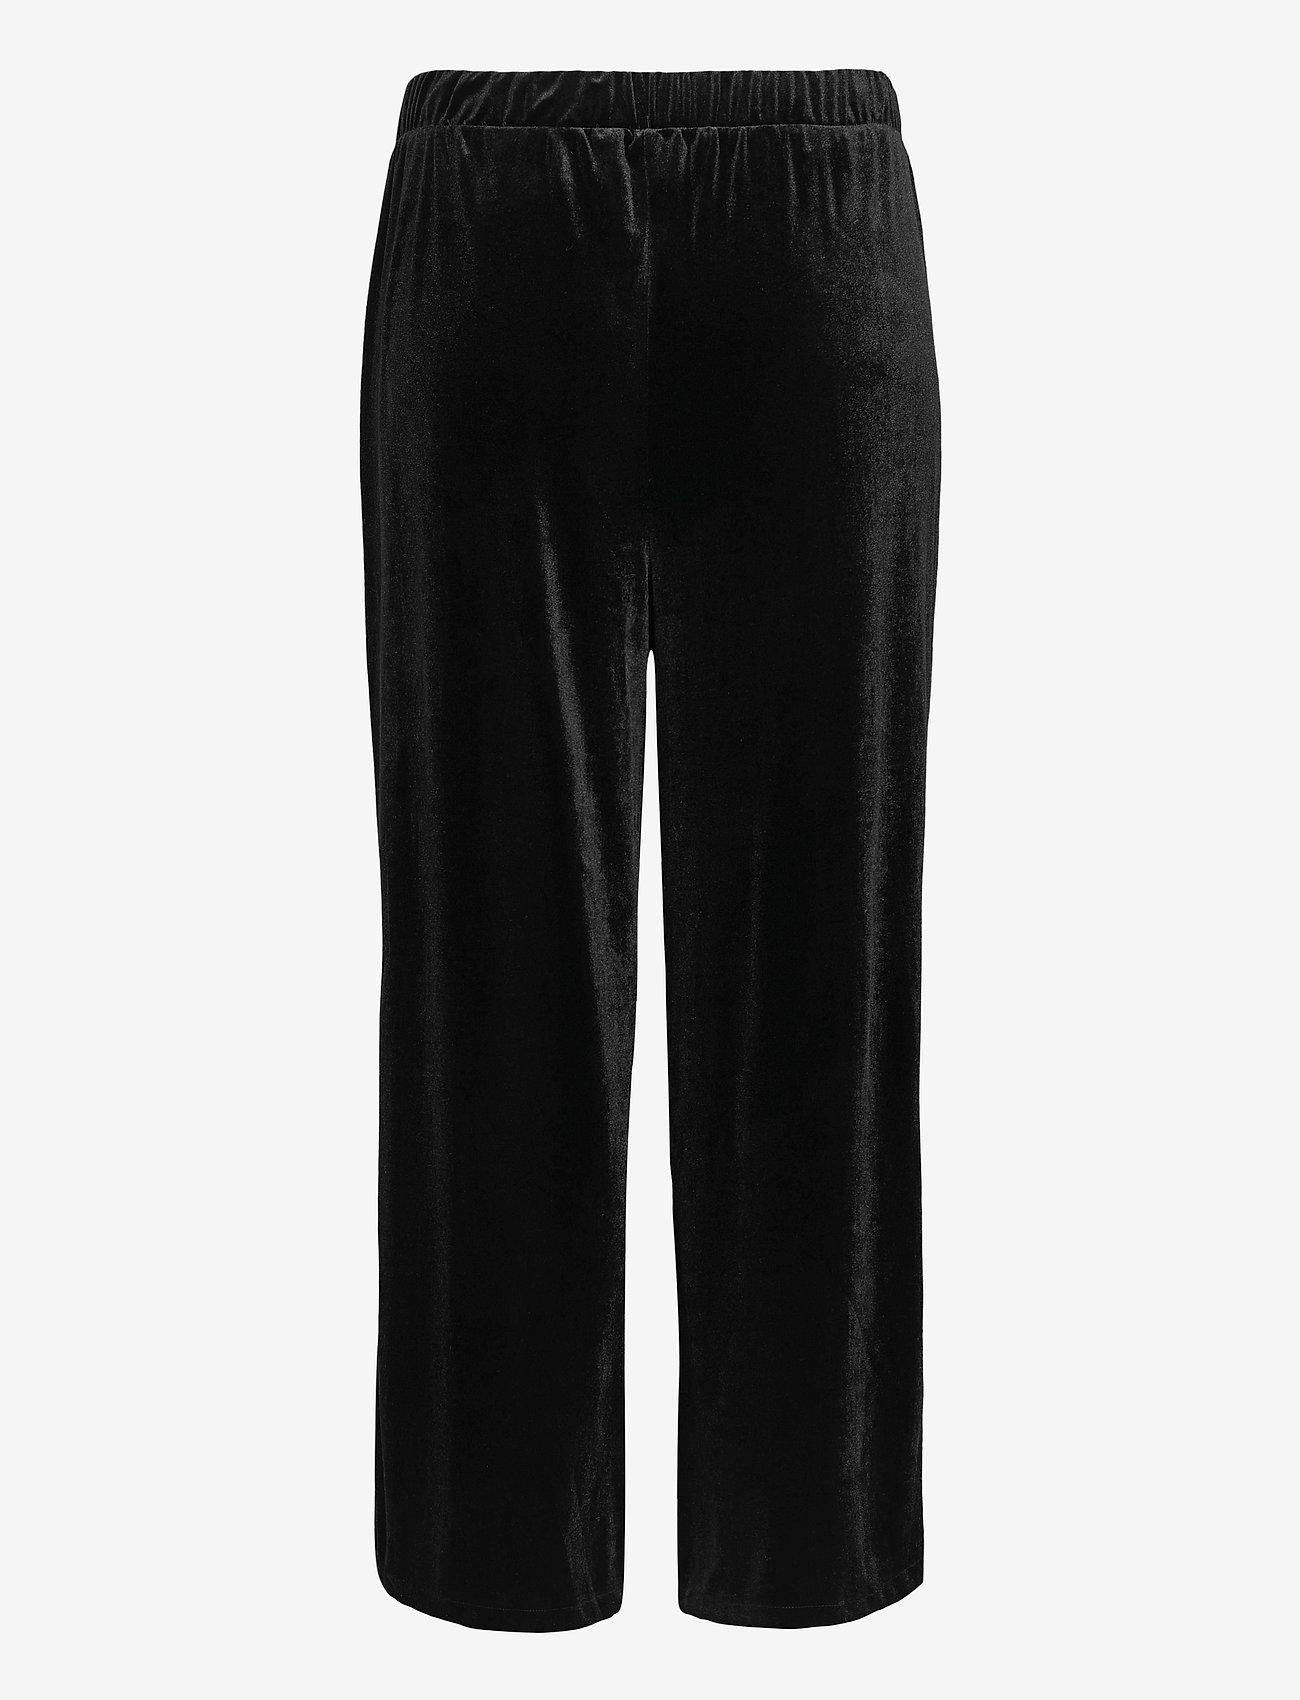 Zizzi - Pants Velvet Plus Size Loose Fit Elastic Waistband - casual shorts - black - 1